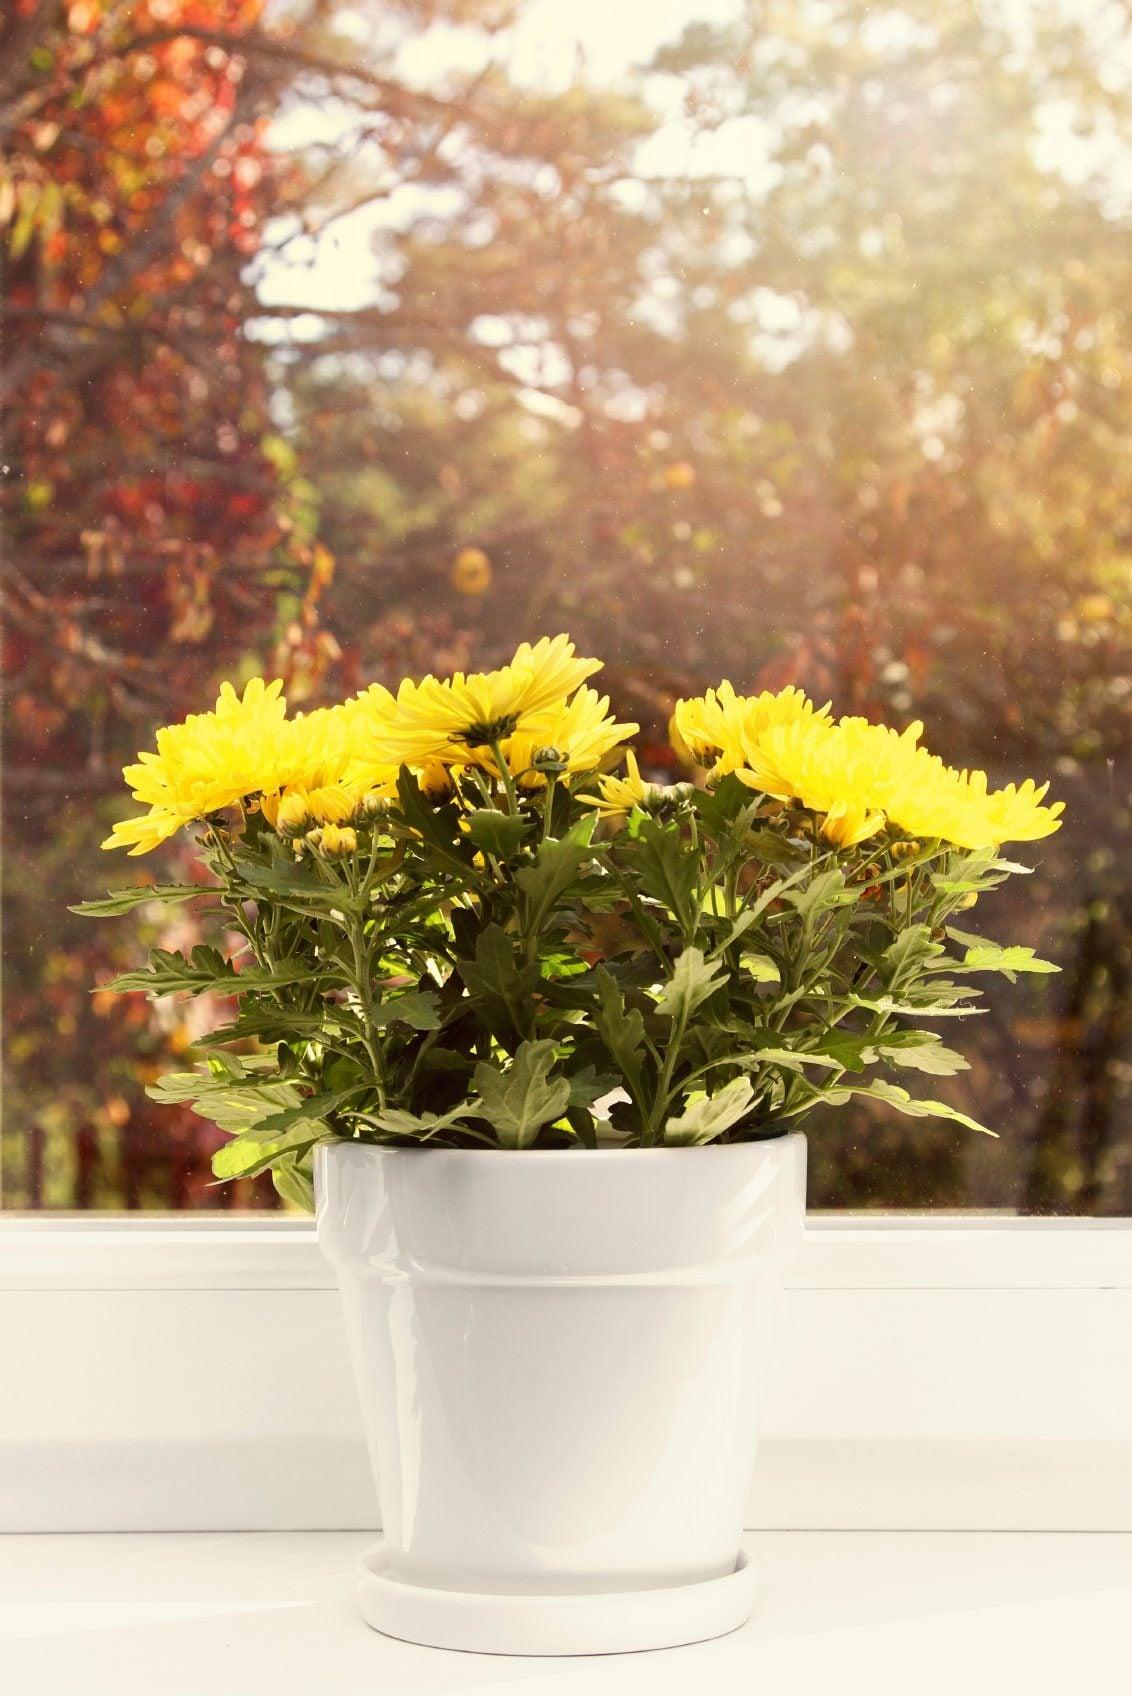 Chrysanthemum houseplants how to grow mums indoors for Indoor gardening flowers